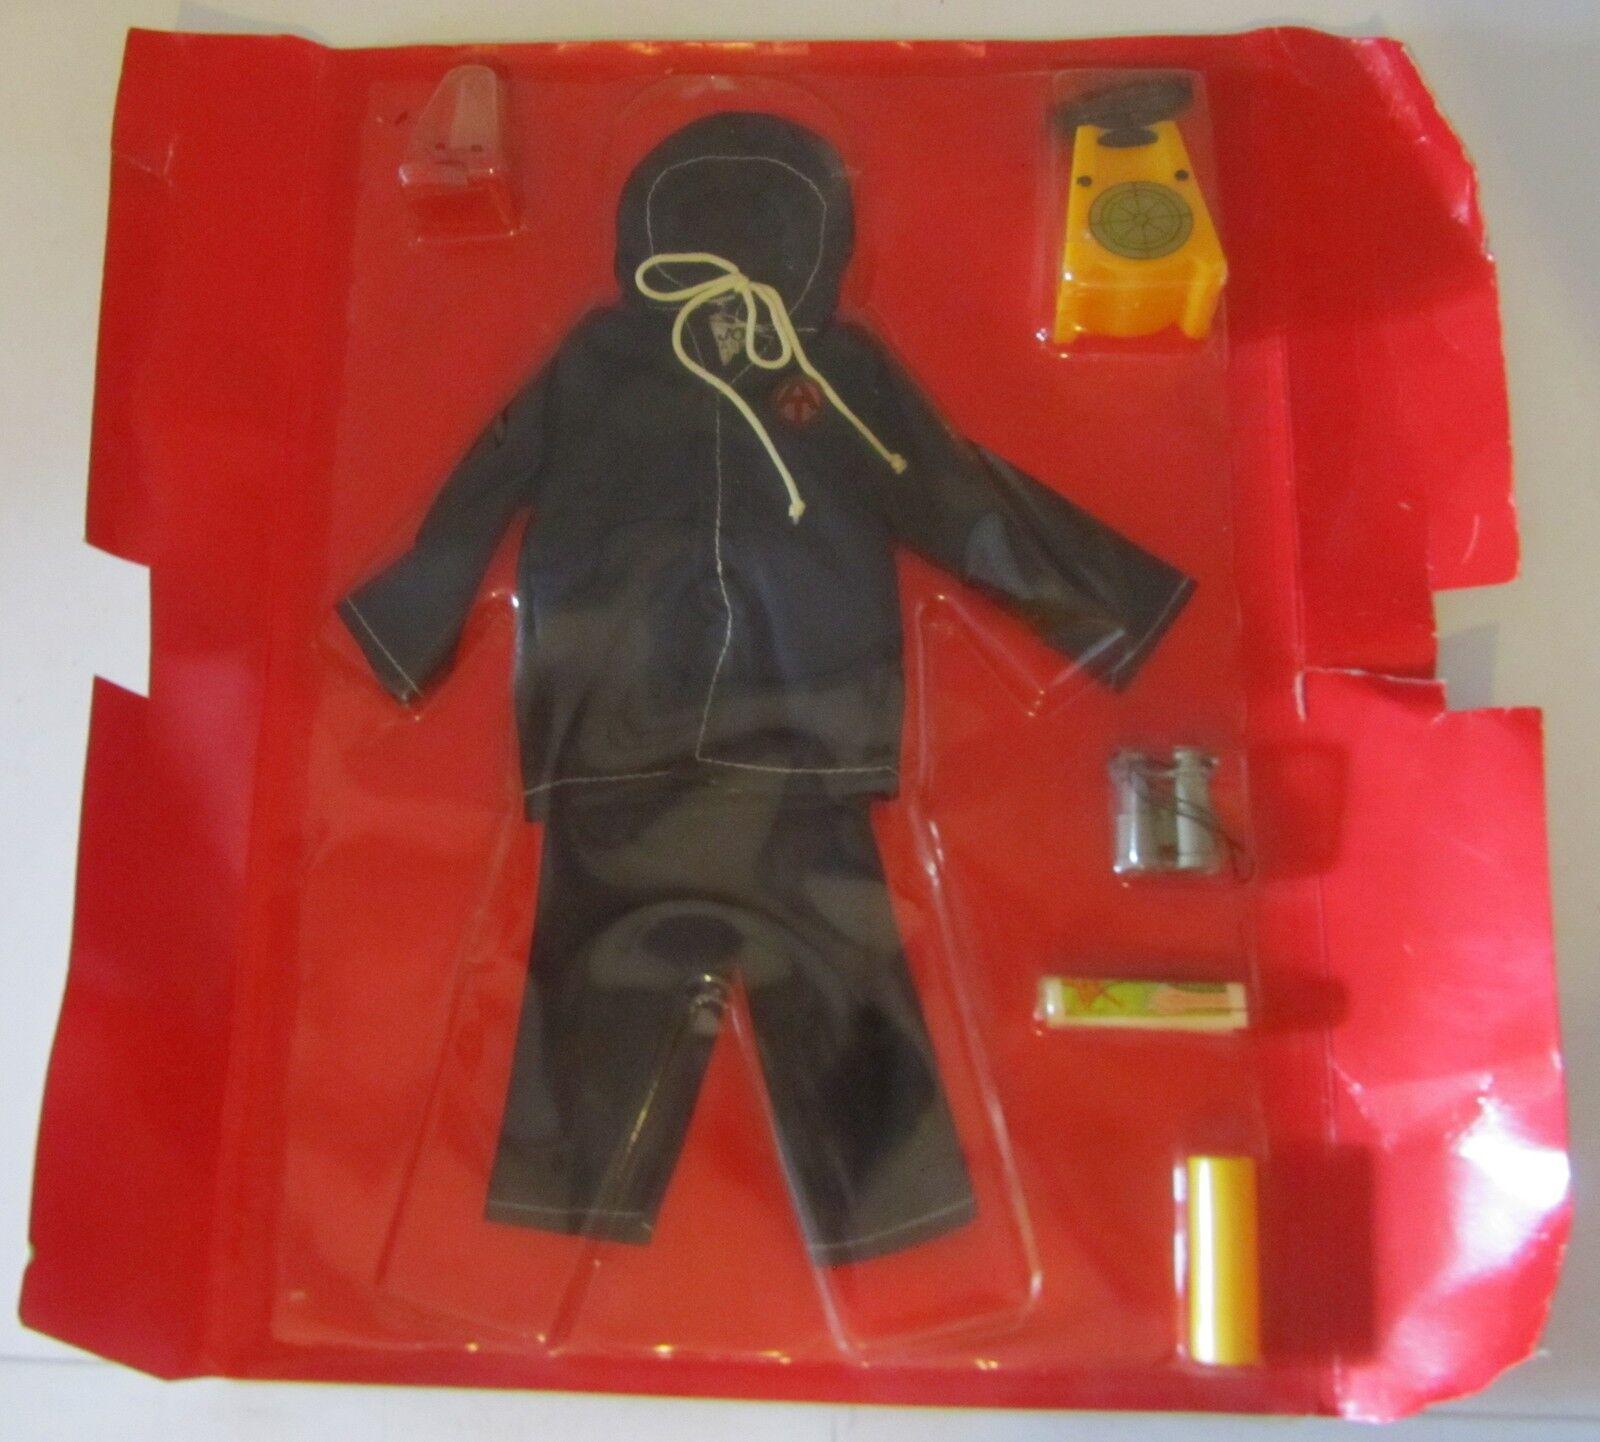 GI Joe Radiation Detection Acción Team Polistil G I Vintage Hasbro outfit